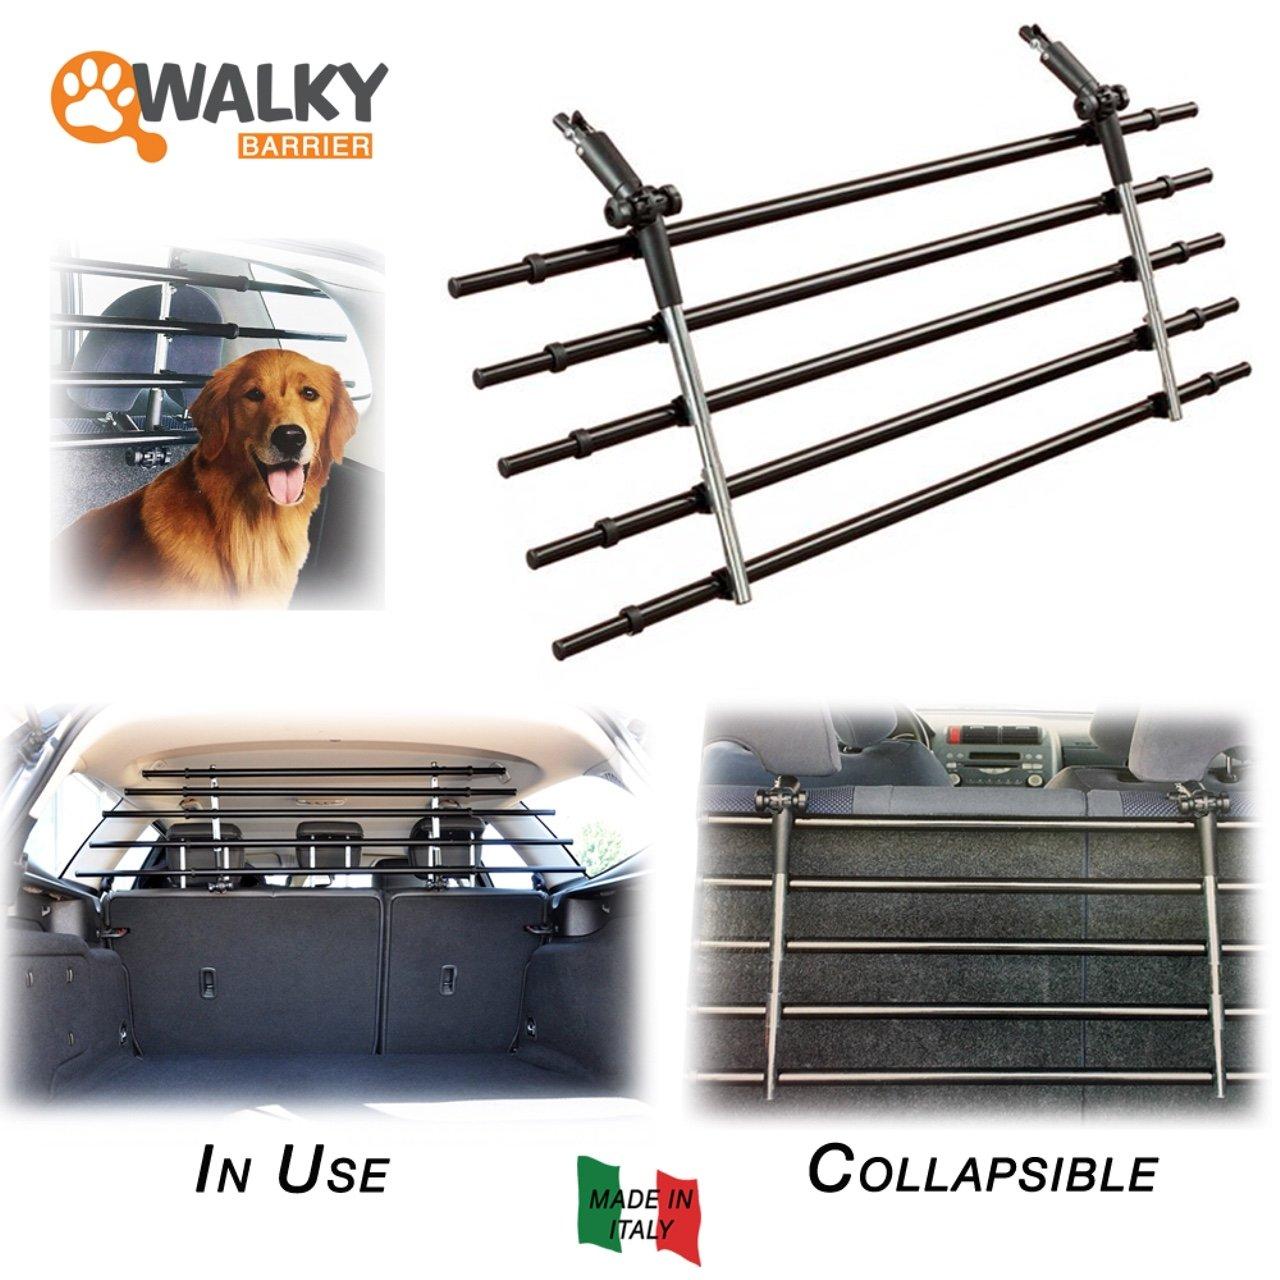 Amazon.com : Walky Barrier, K9 Auto Guard Barrier, Foldable Auto Pet ...